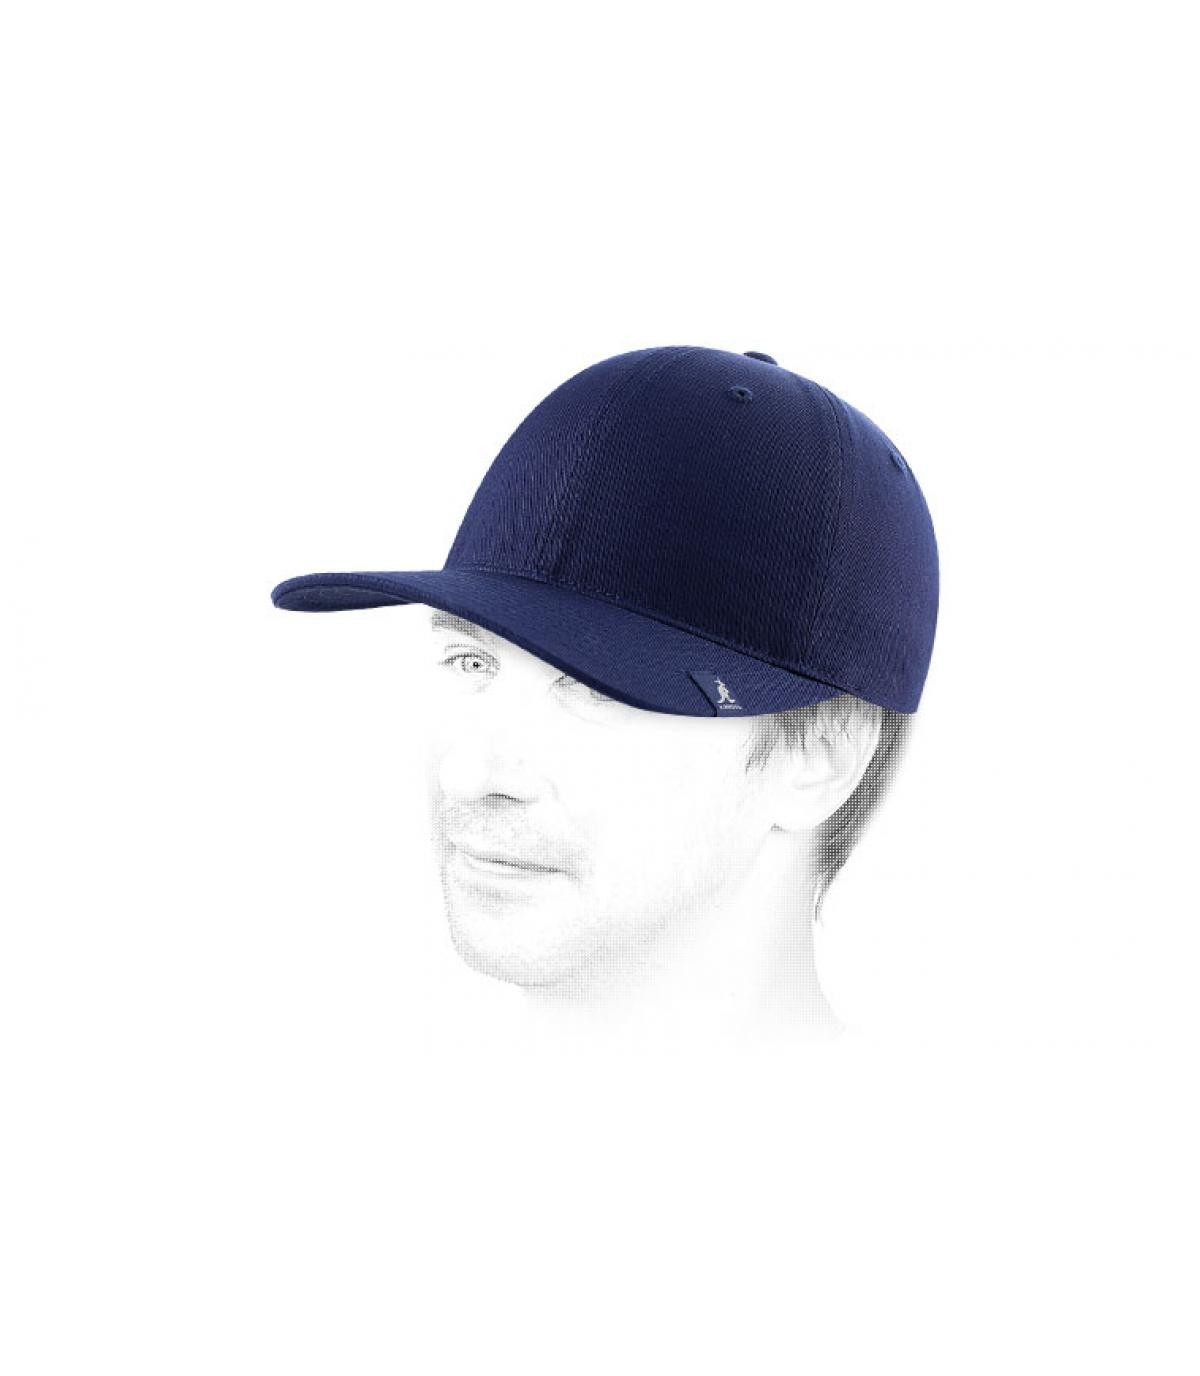 Cappellino baseball blu marine